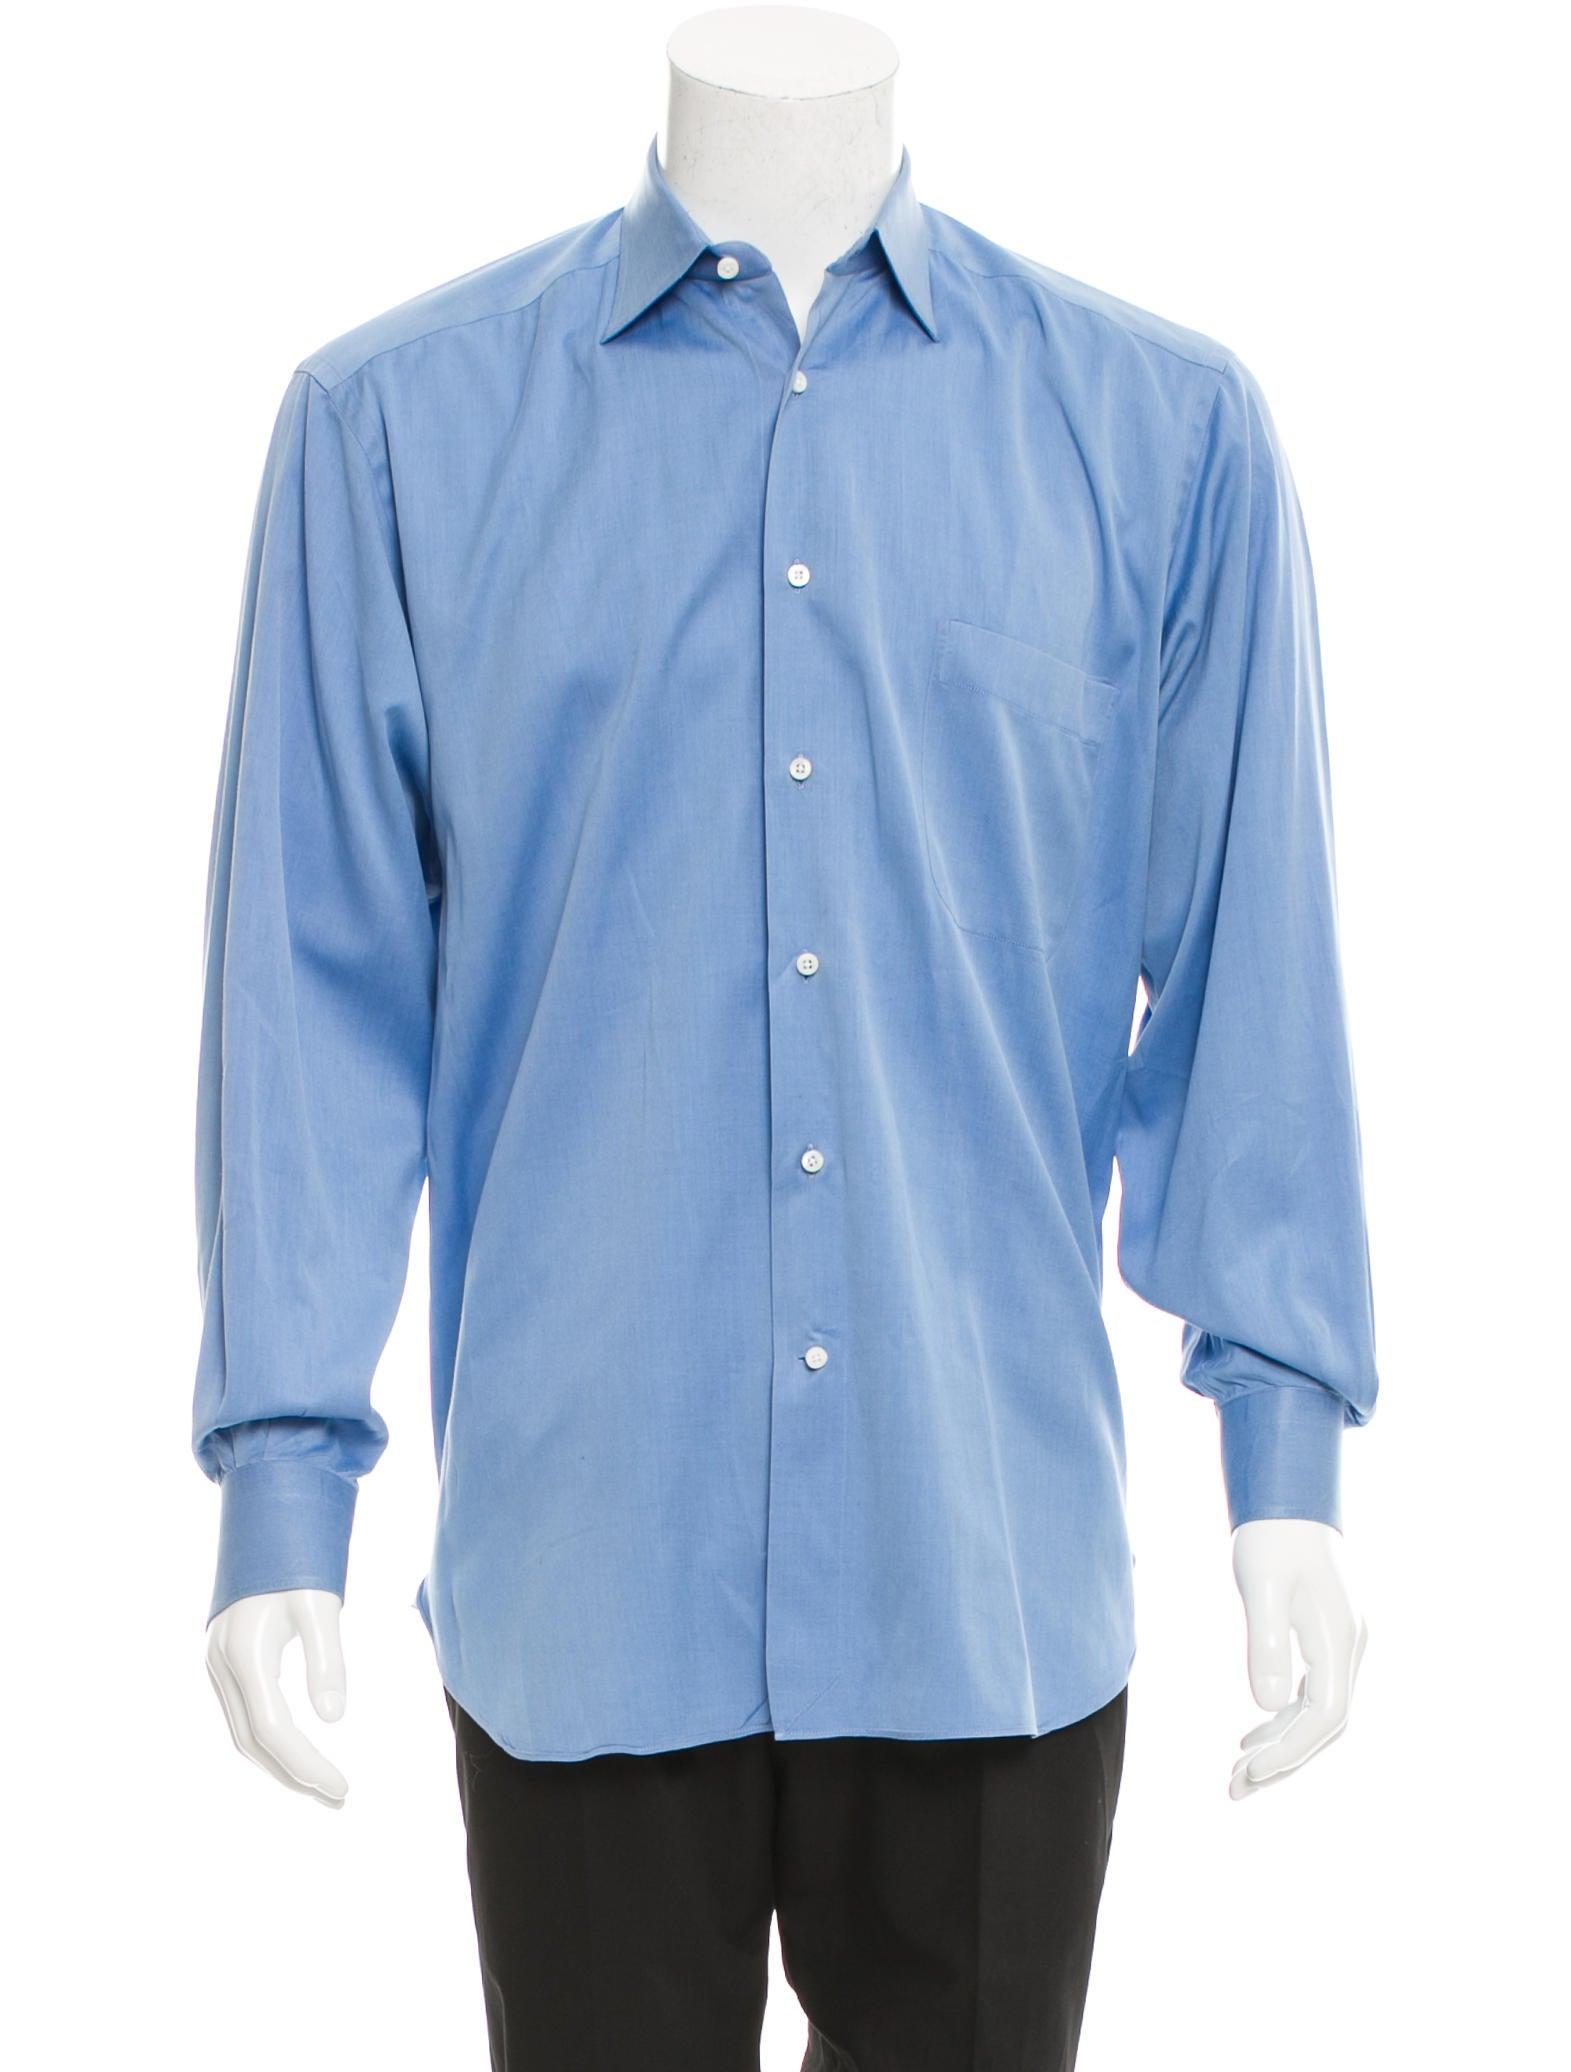 ermenegildo zegna woven button up shirt clothing zgn24252 the realreal. Black Bedroom Furniture Sets. Home Design Ideas